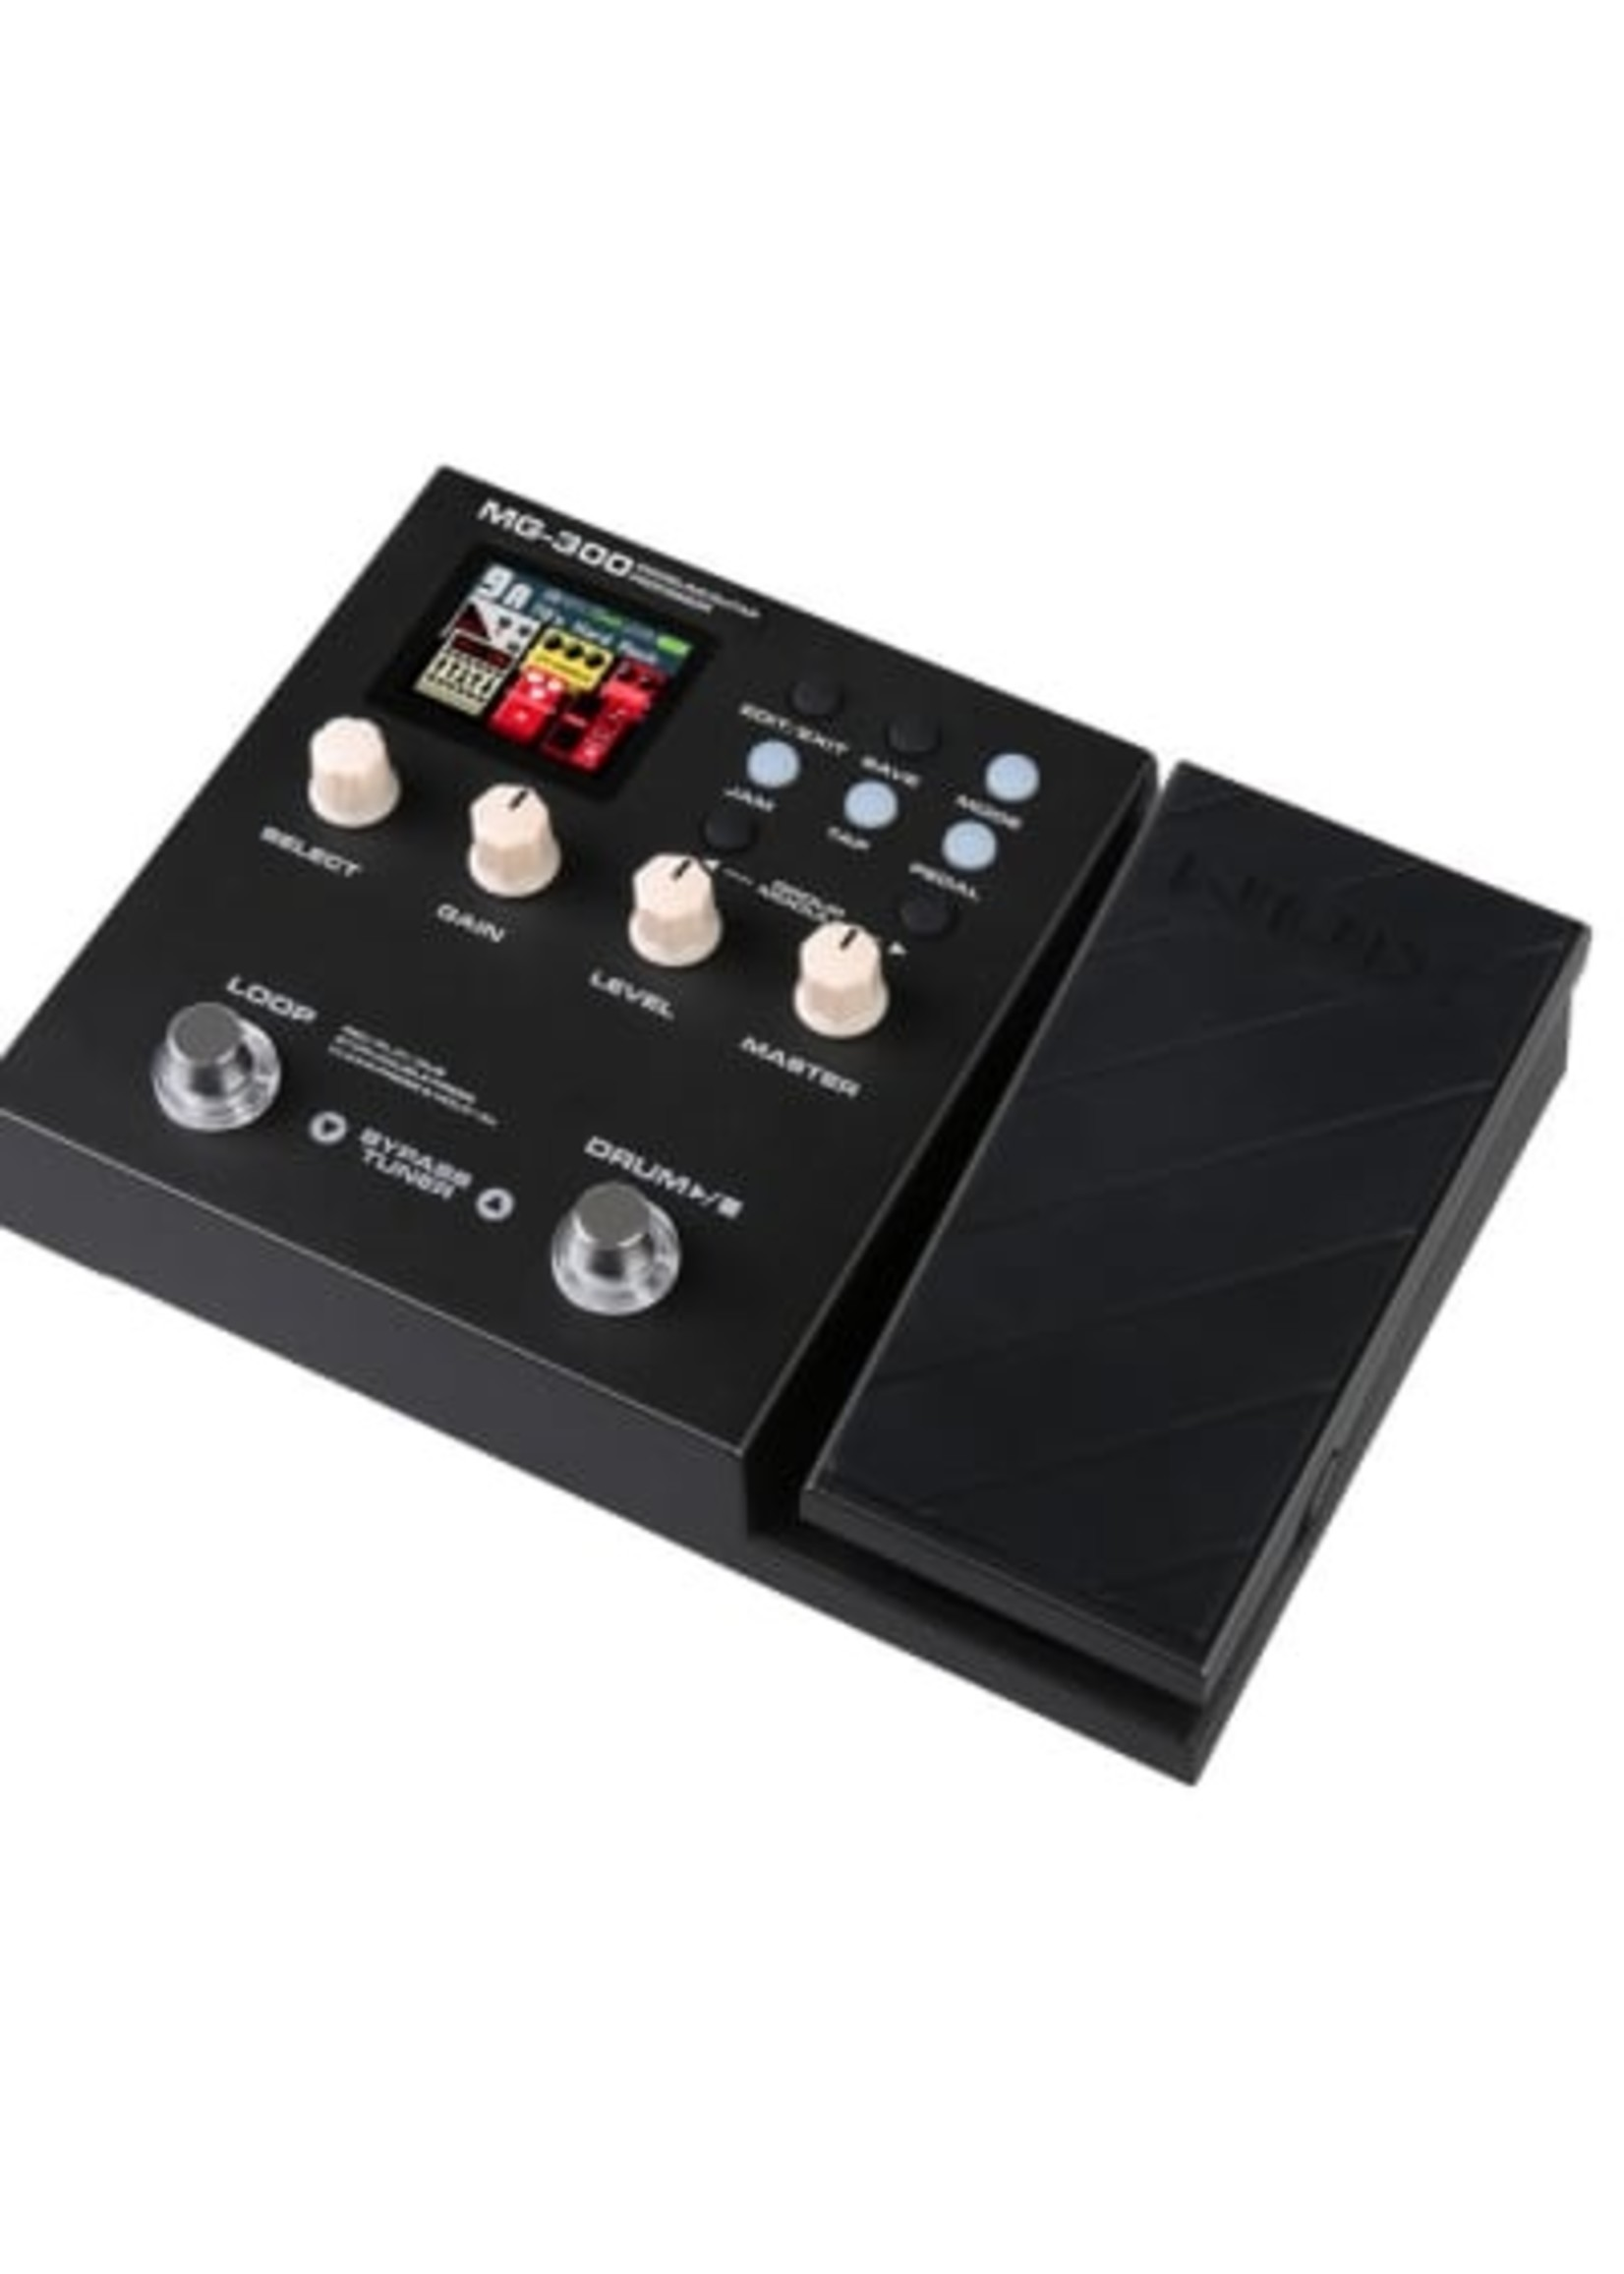 NuX NUX MG-300 Multi Effects Guitar prtocessor